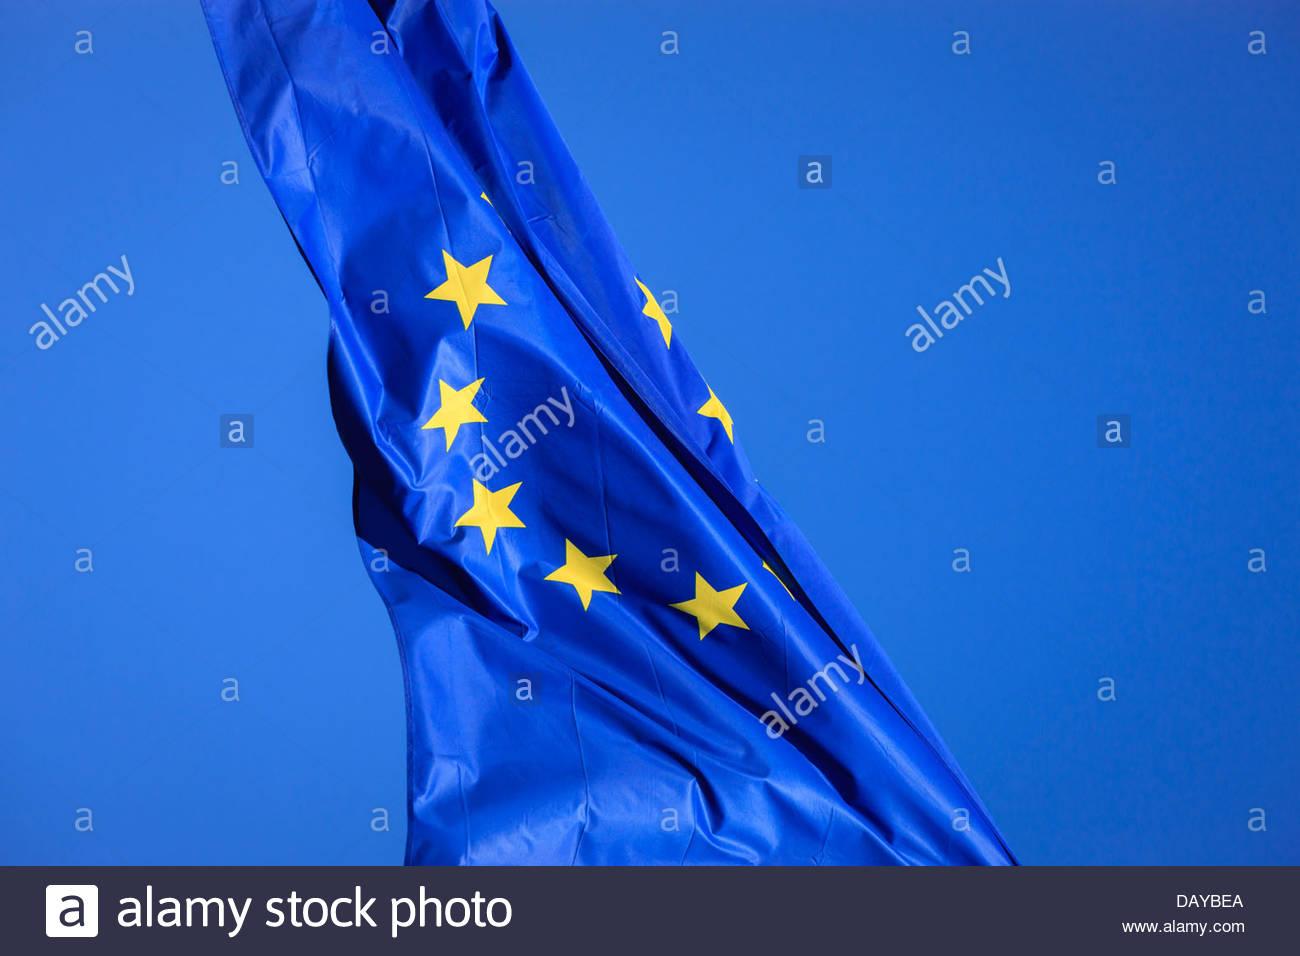 European Union Eu flag flying against blue sky - Stock Image